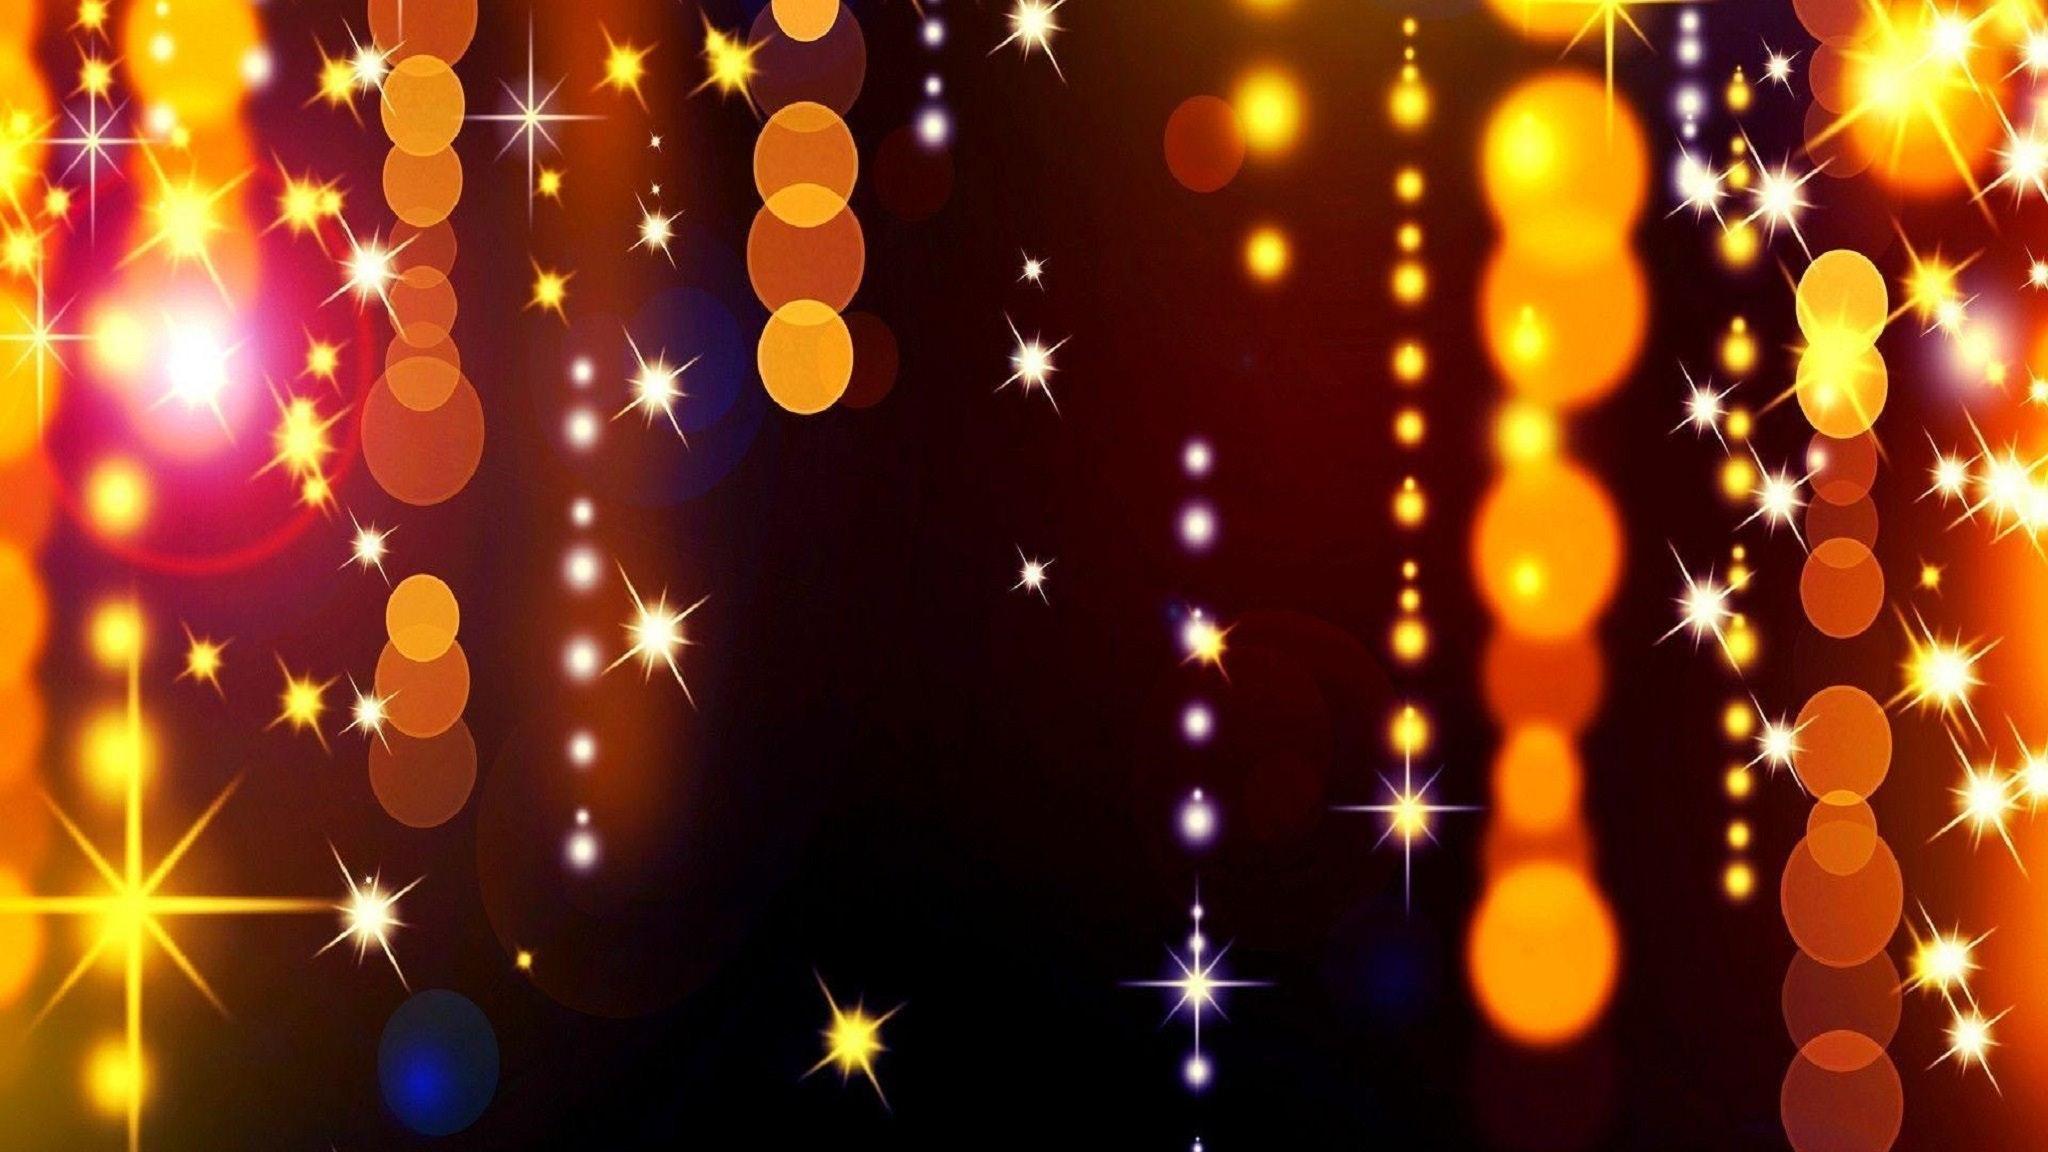 Christms lights